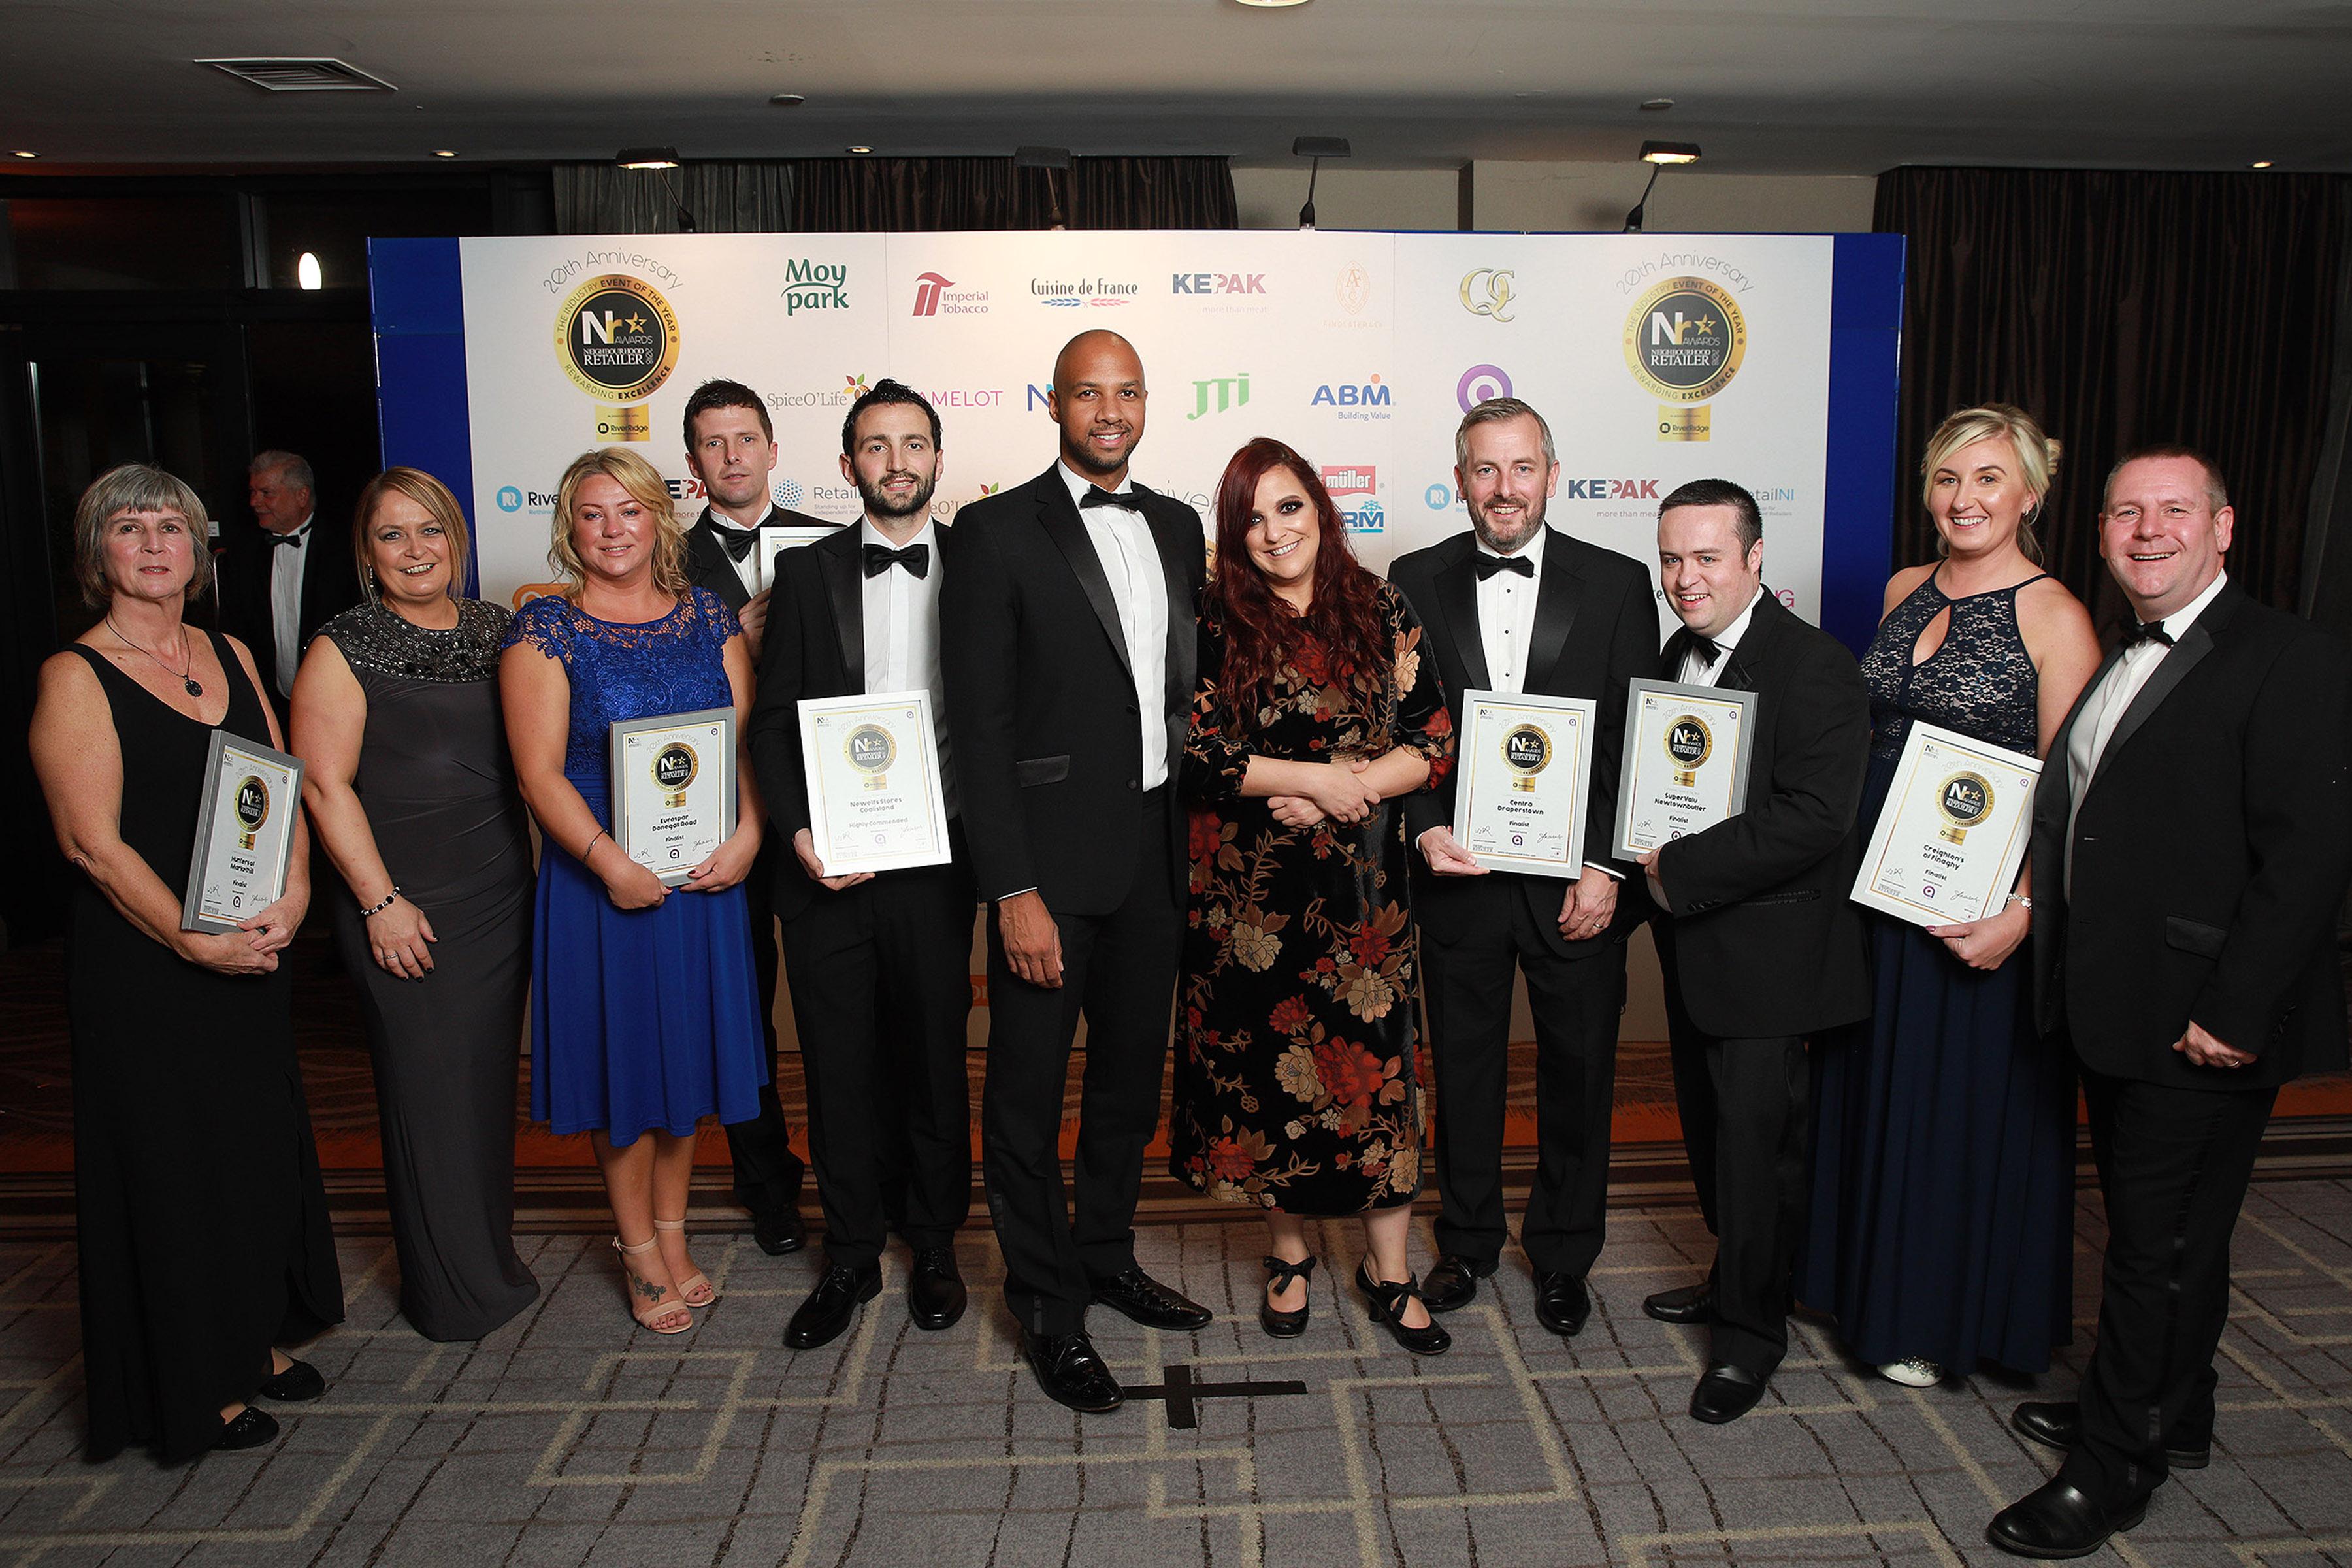 Neighbourhood Retailer Awards 2018 - Community Store of the Year finalists